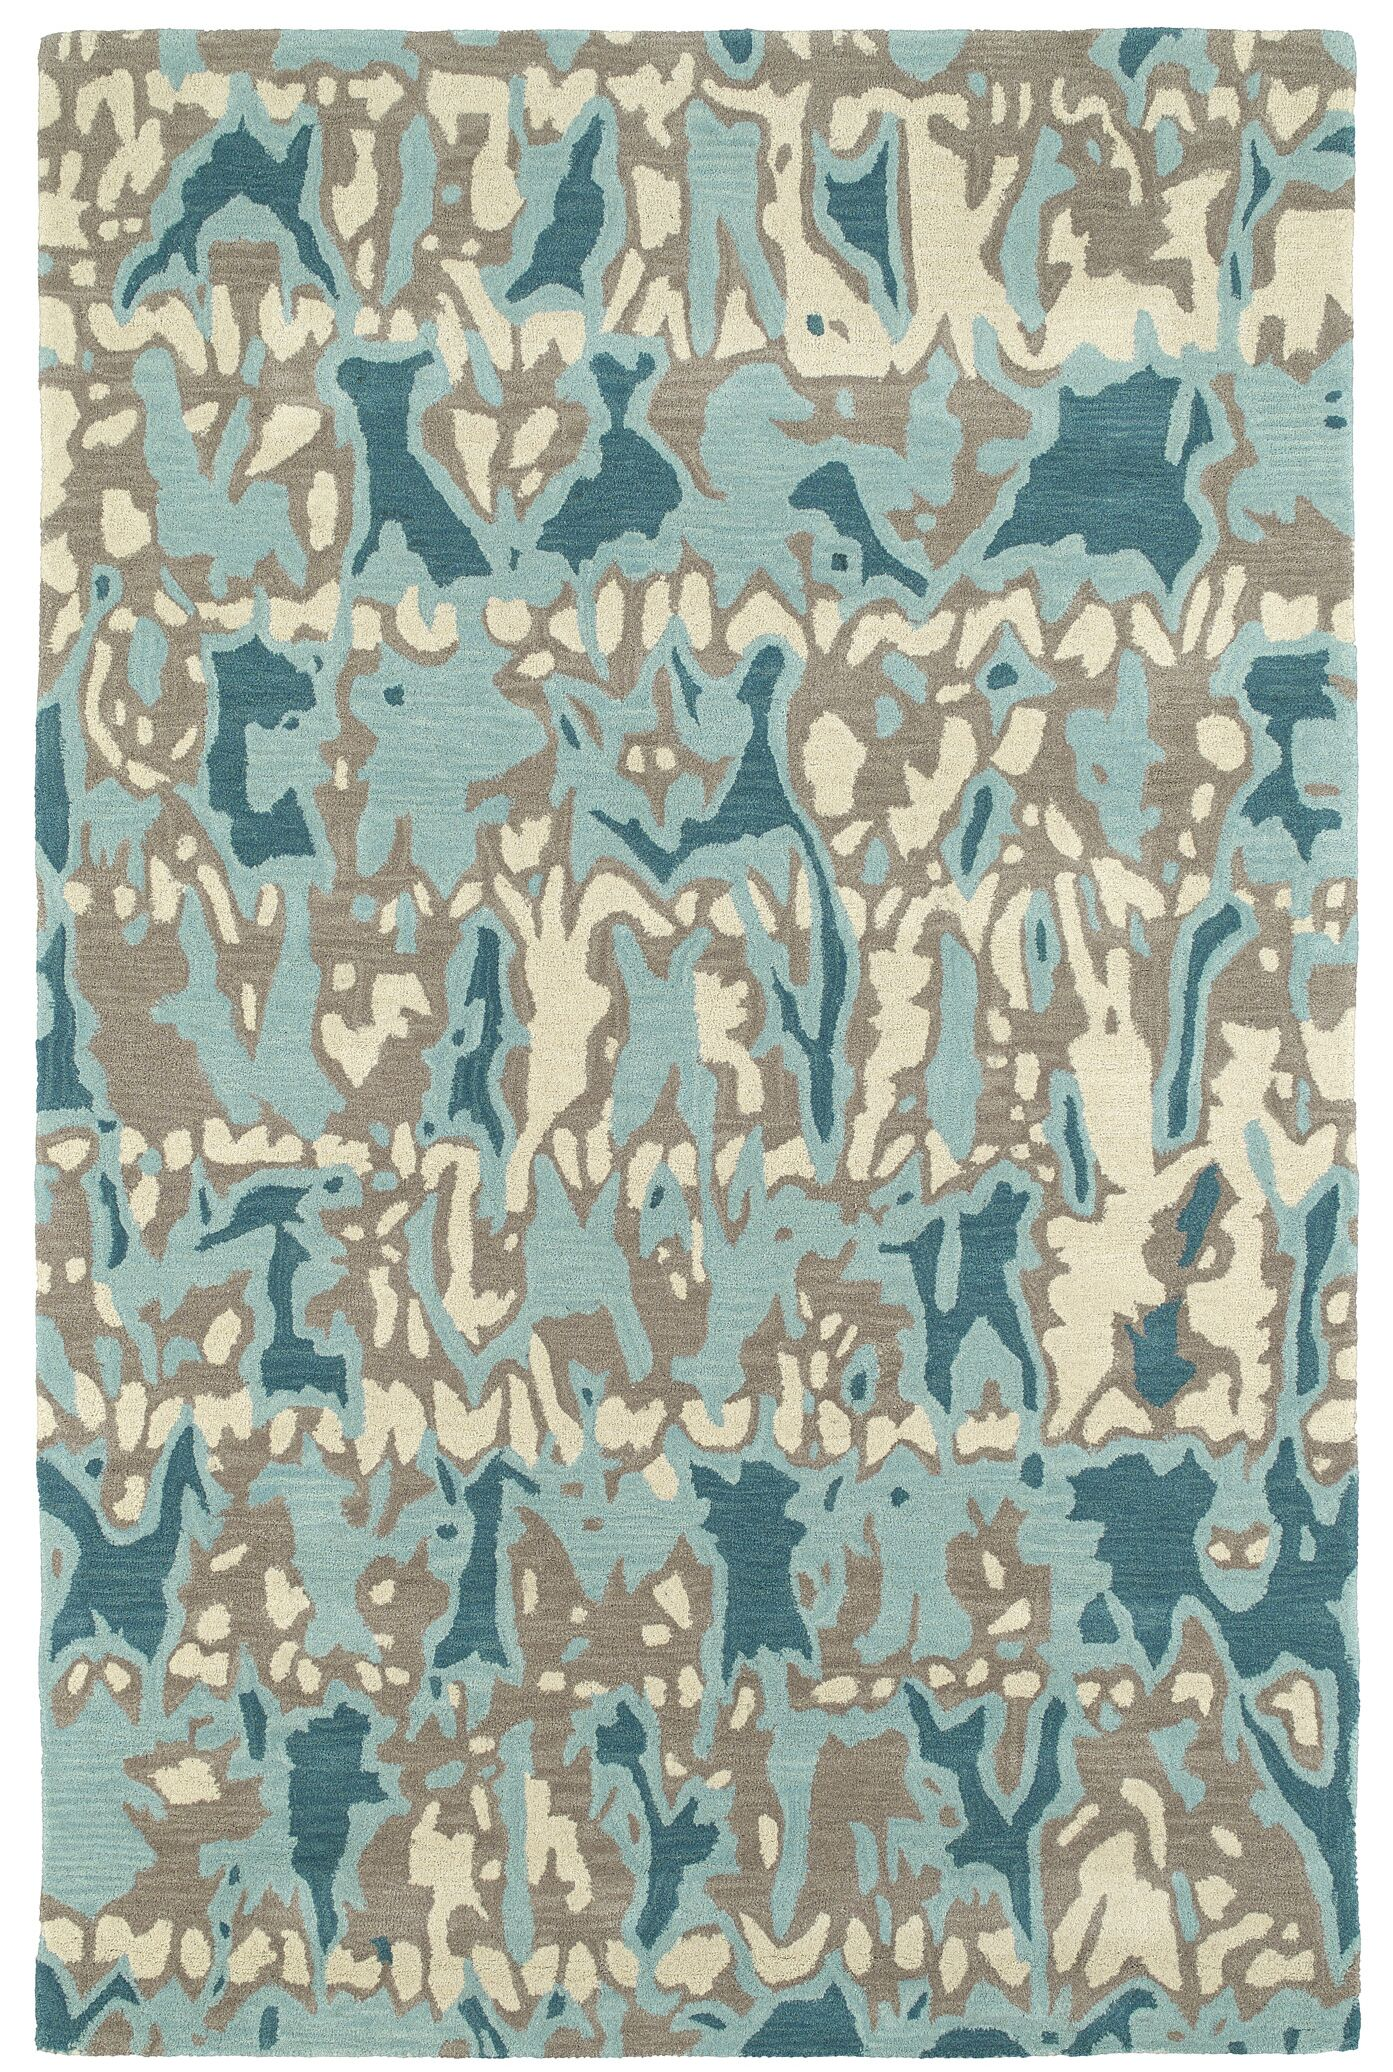 Charlayne Hand Tufted Beige/Blue Area Rug Rug Size: Rectangle 8' x 10'